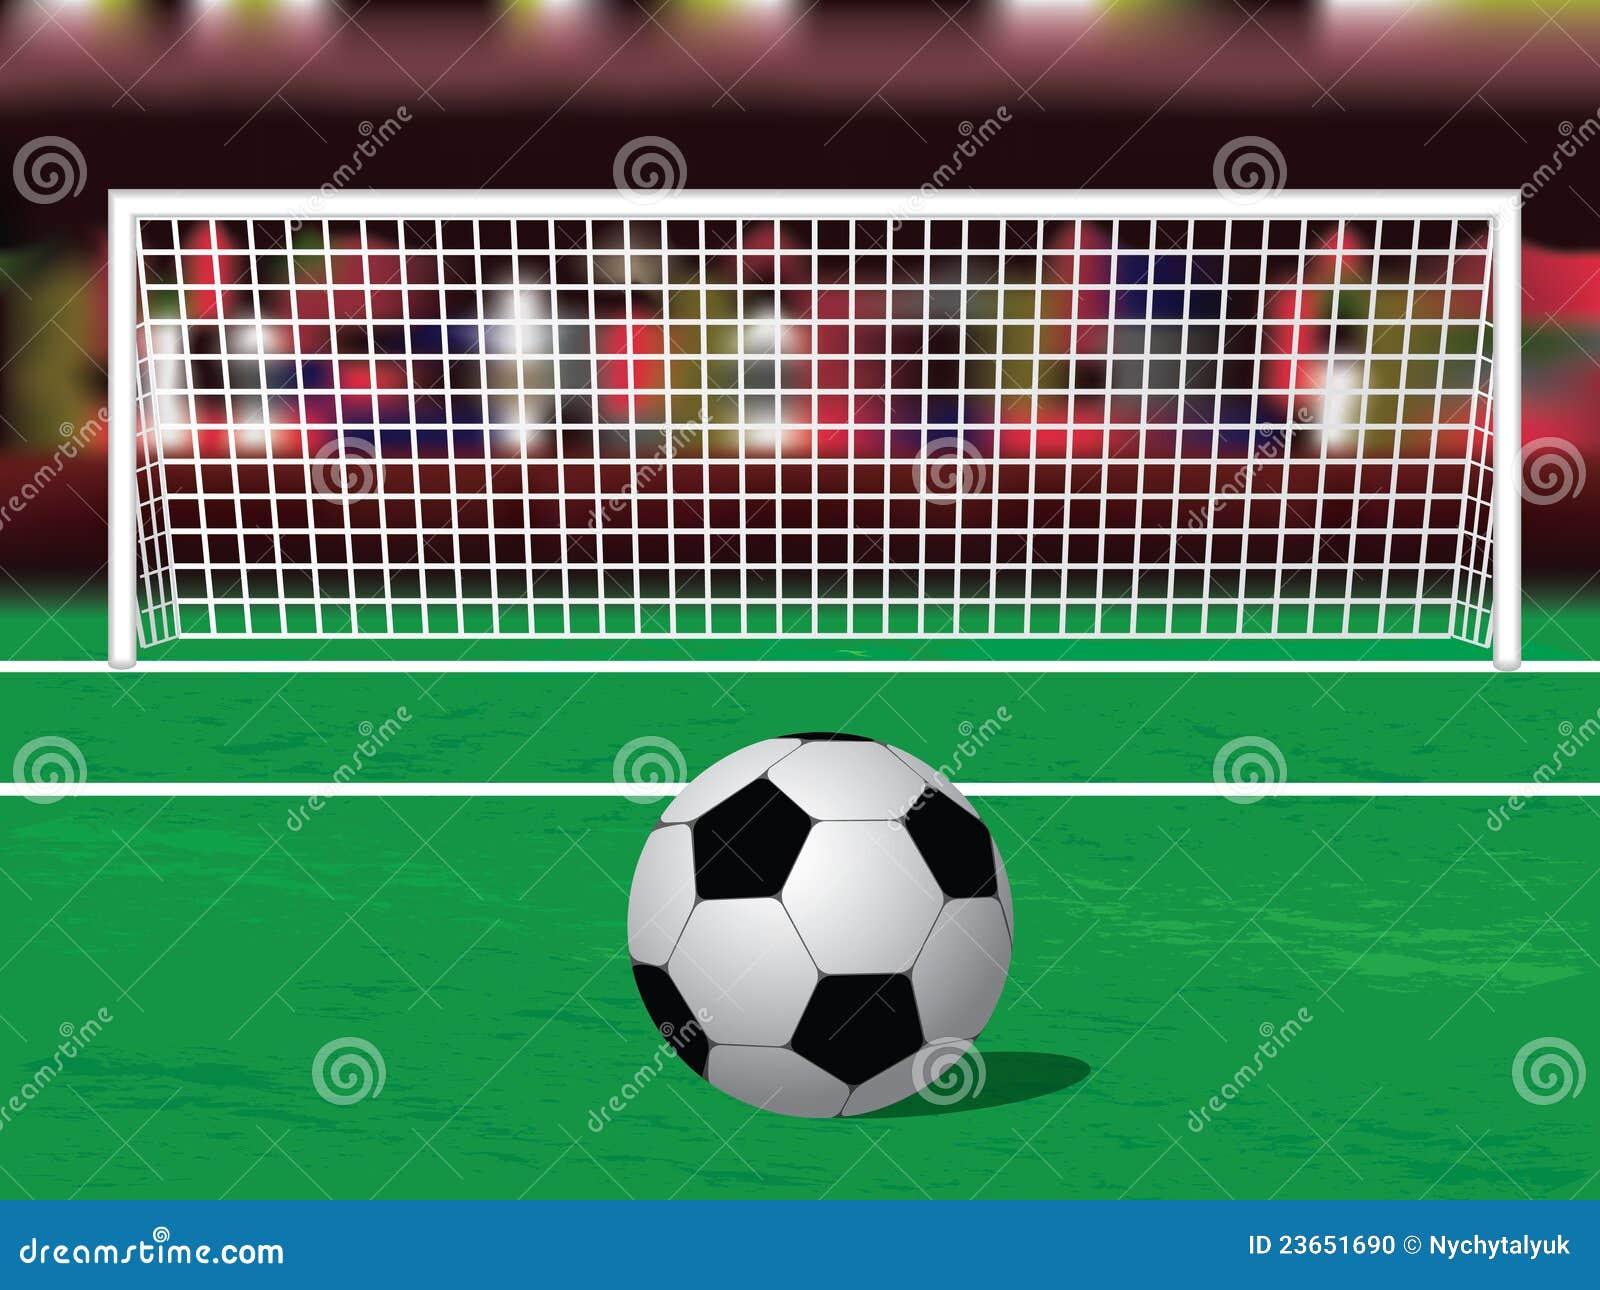 football   soccer penalty ball on the penalty spot football field clip art pics football field clip art grass